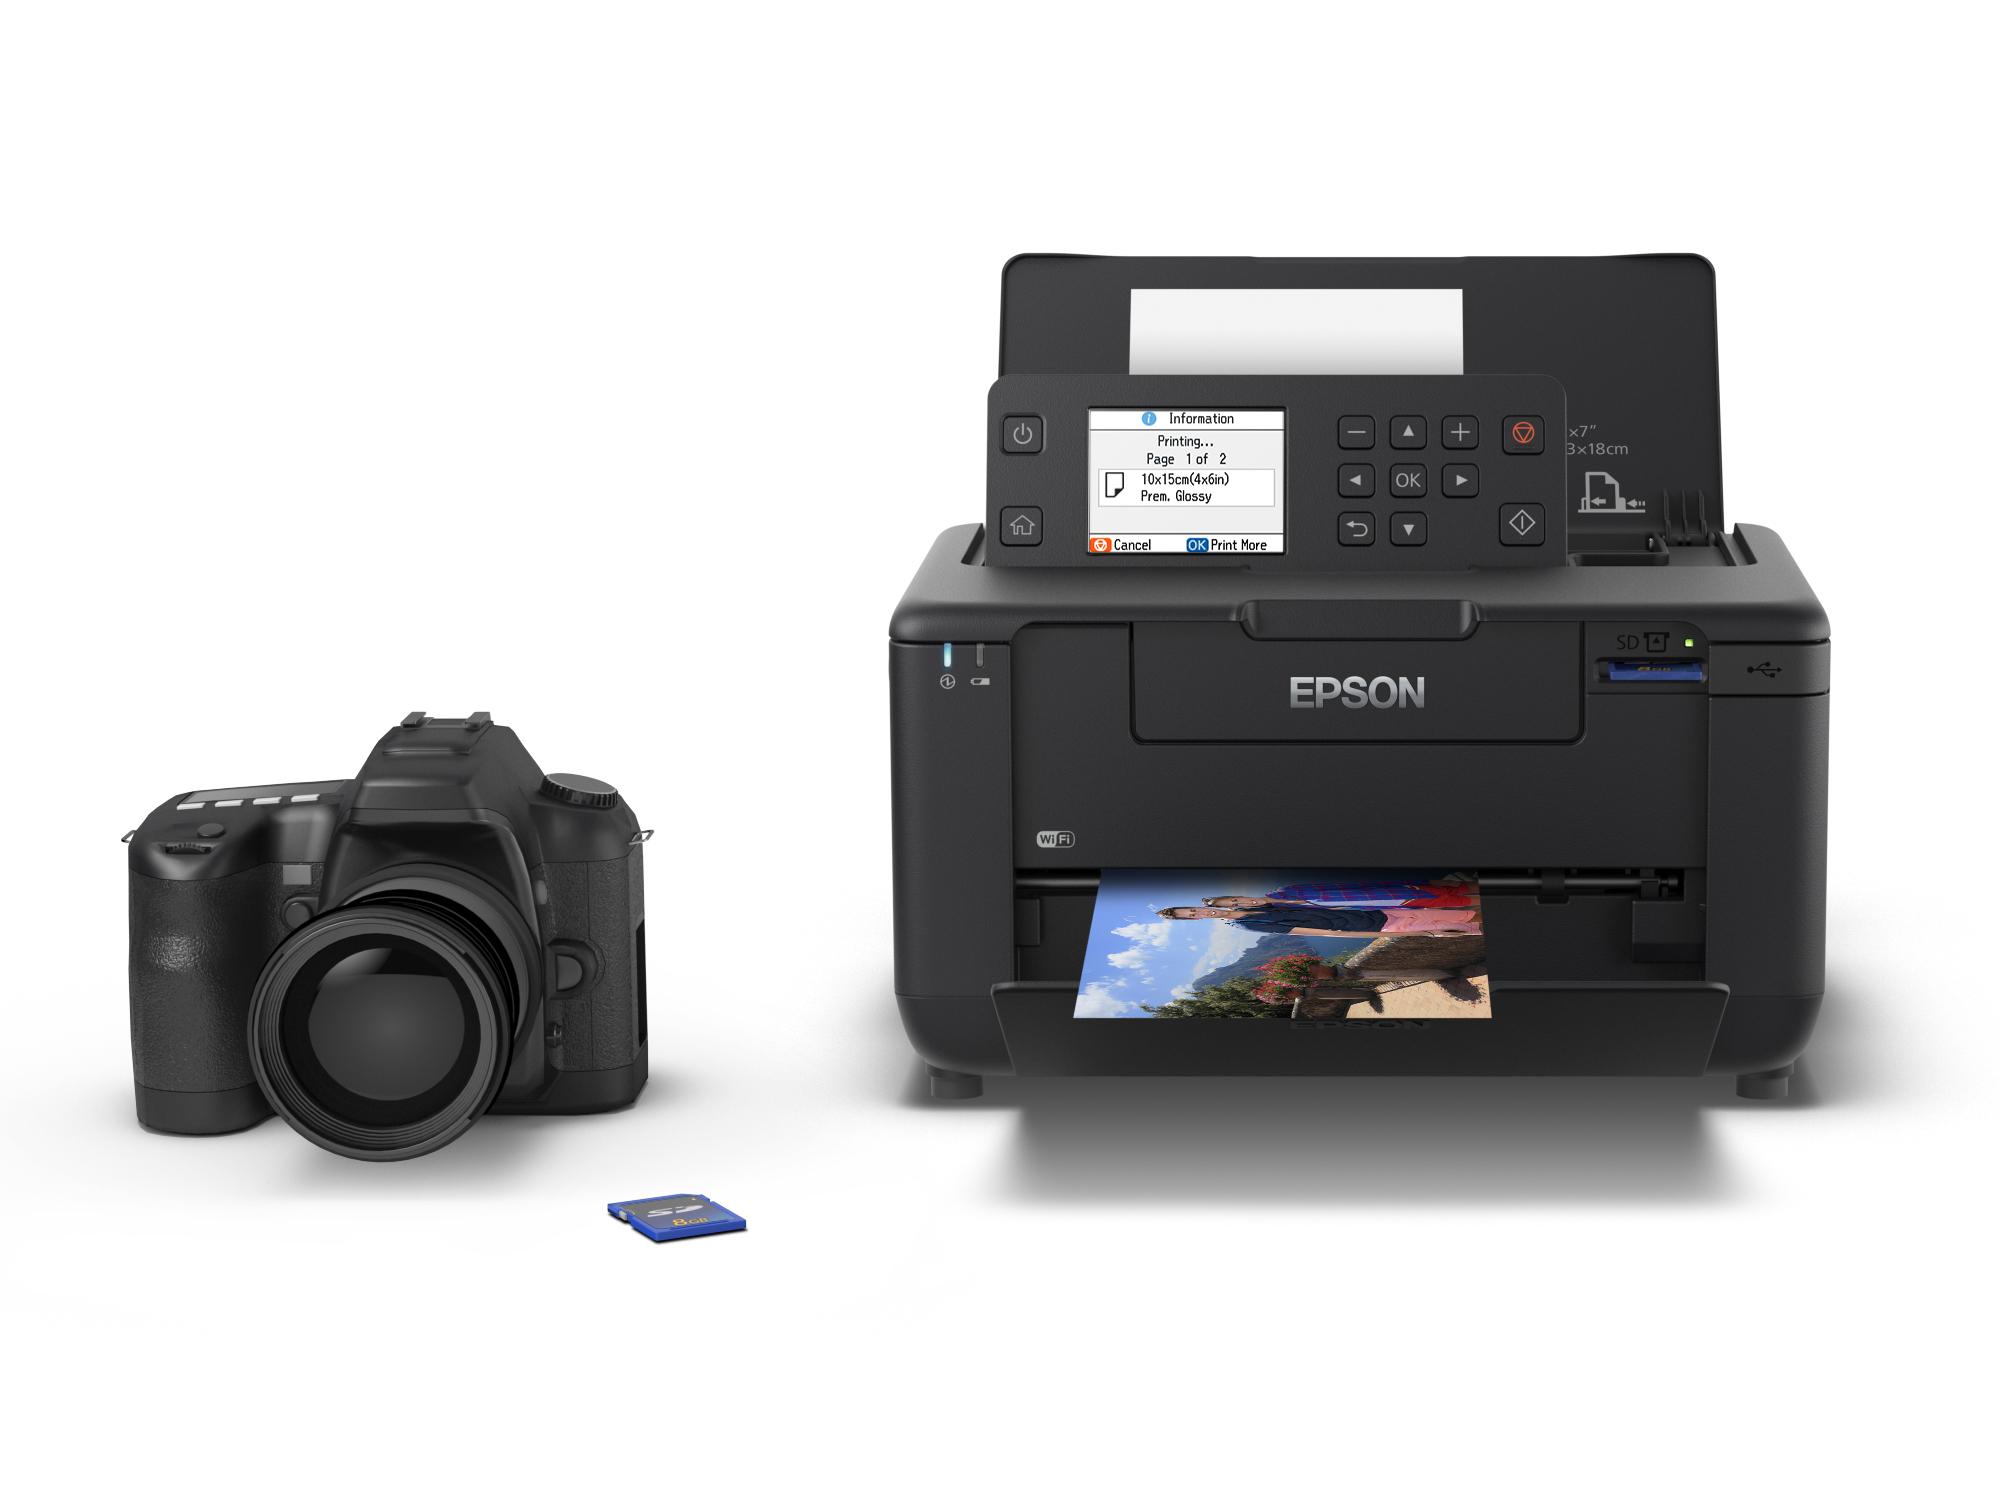 PictureMate PM 525 2 - Epson presenta su nuevo modelo de impresora fotográfica portátil